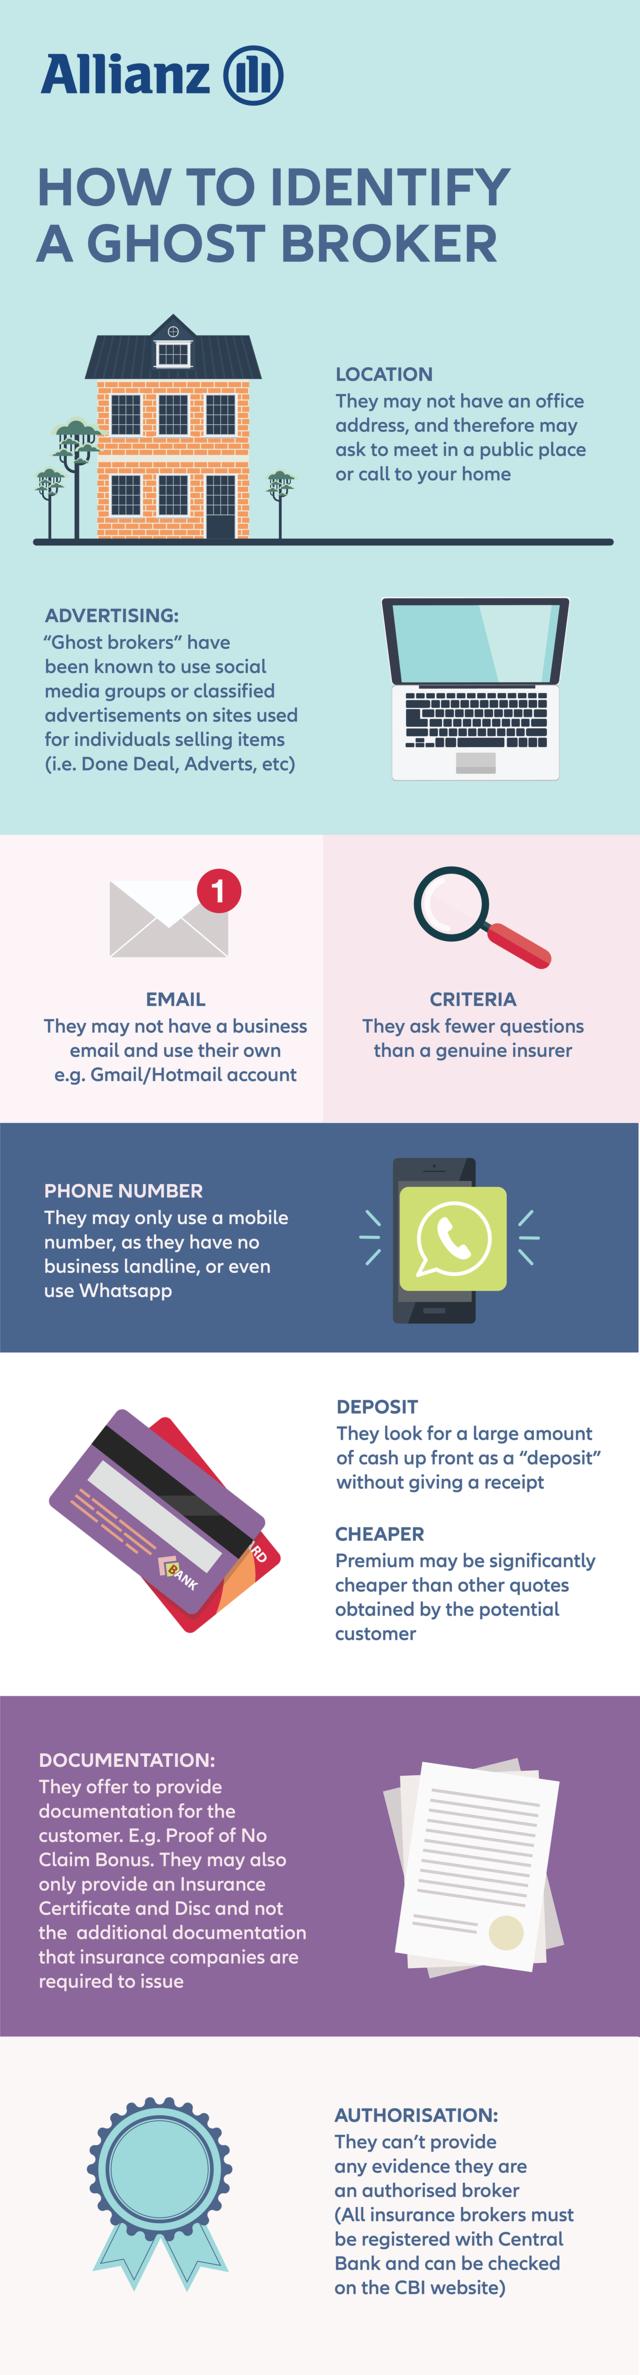 Ghost broker infographic (social)